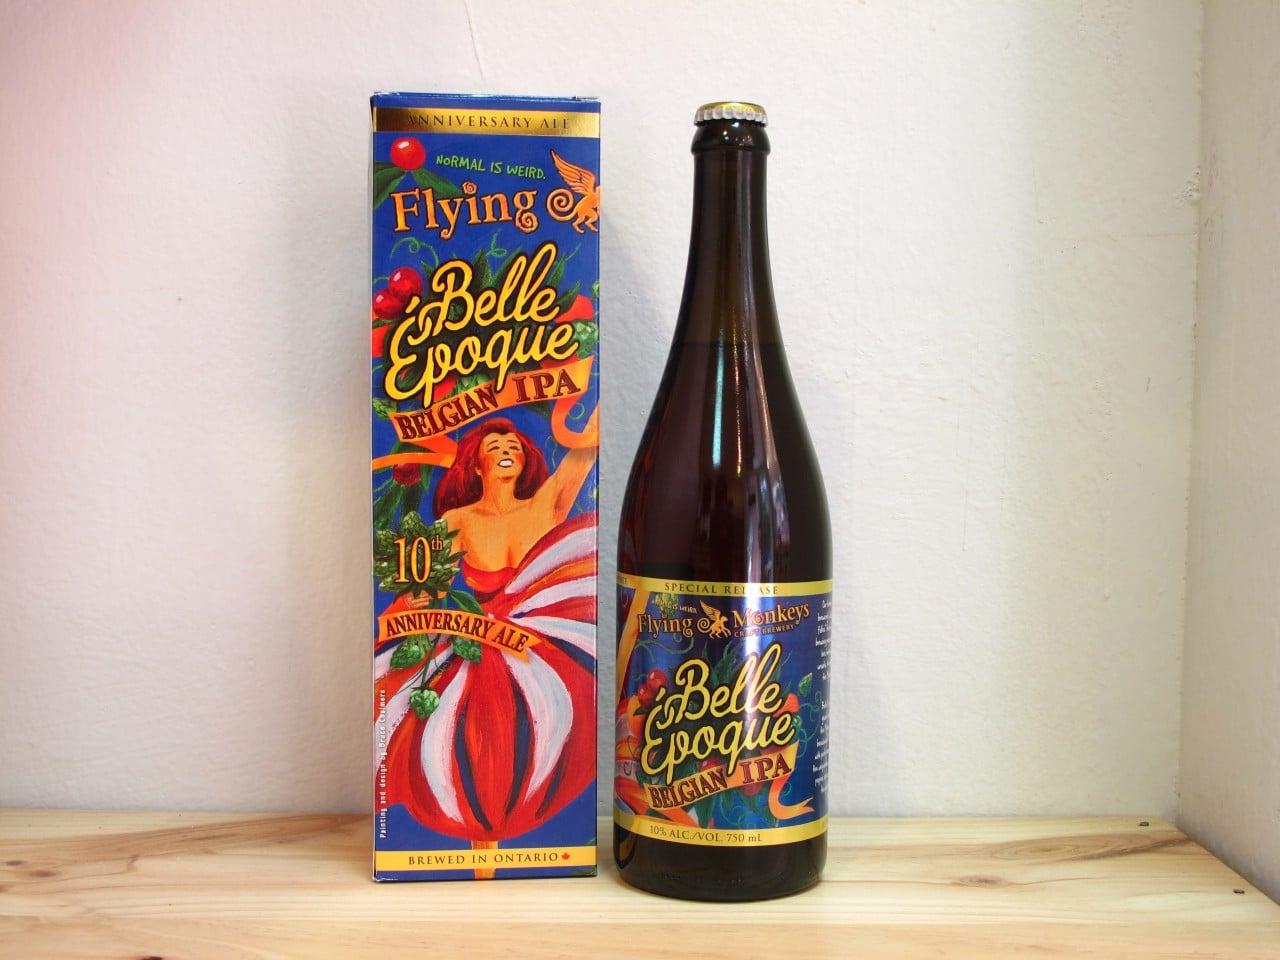 Cerveza Flying Monkeys Belle Epoque